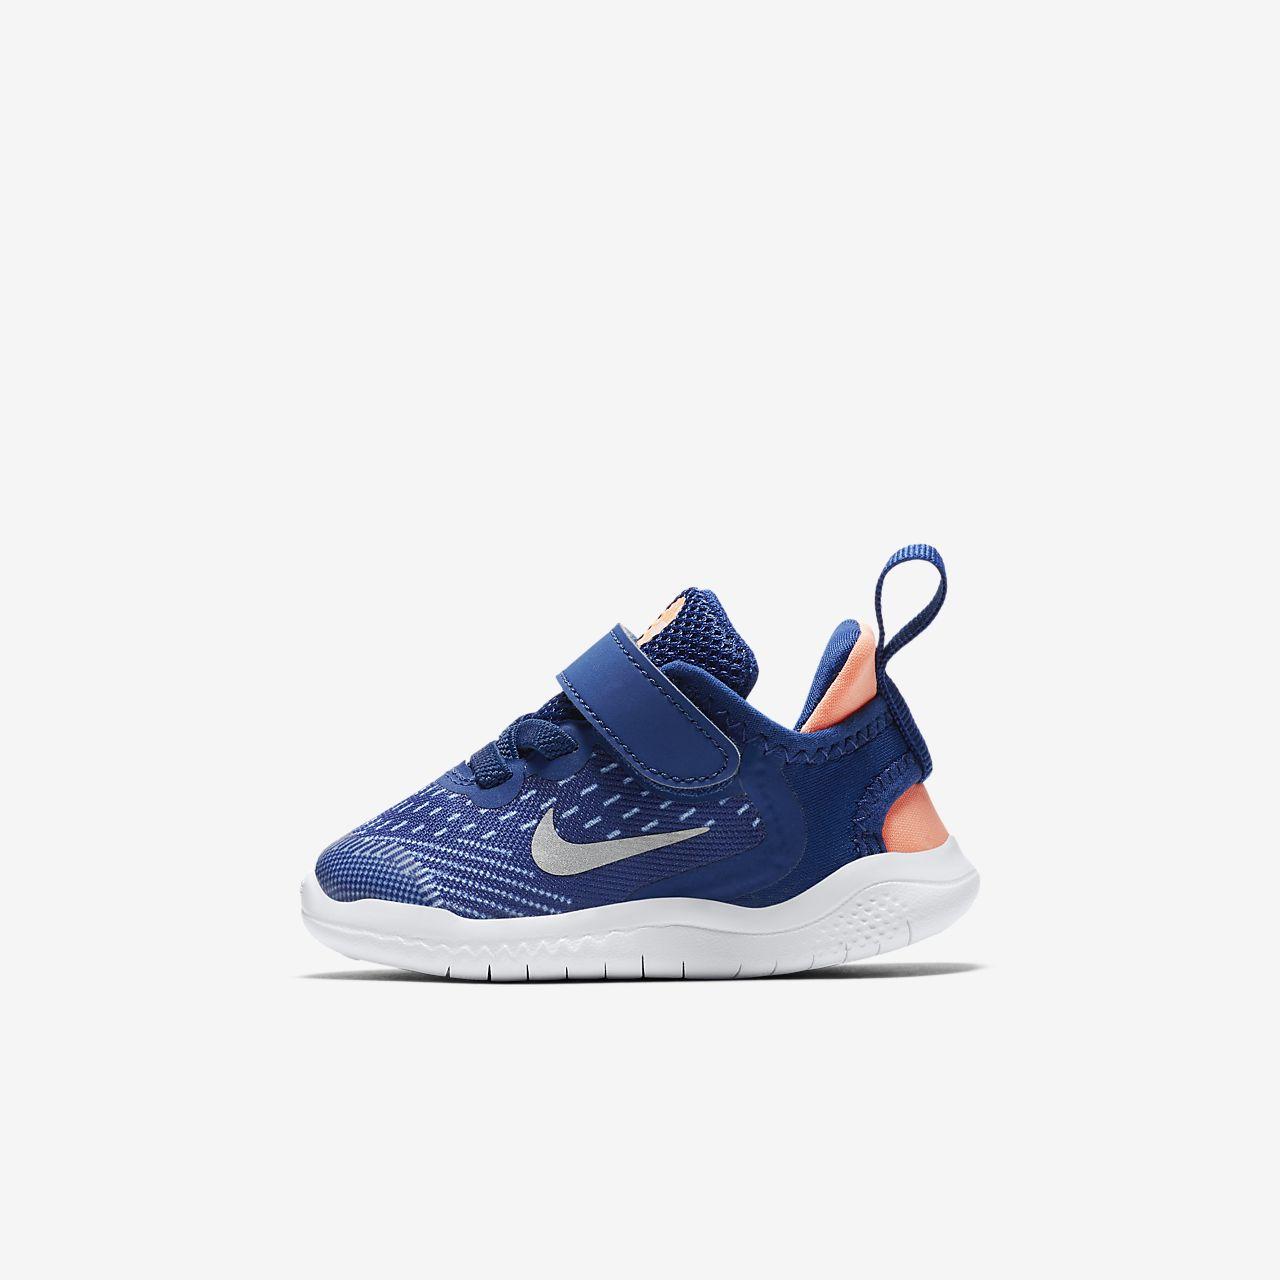 newest 70ad7 67c0c Baby amp Toddler Shoe. Nike Free RN 2018